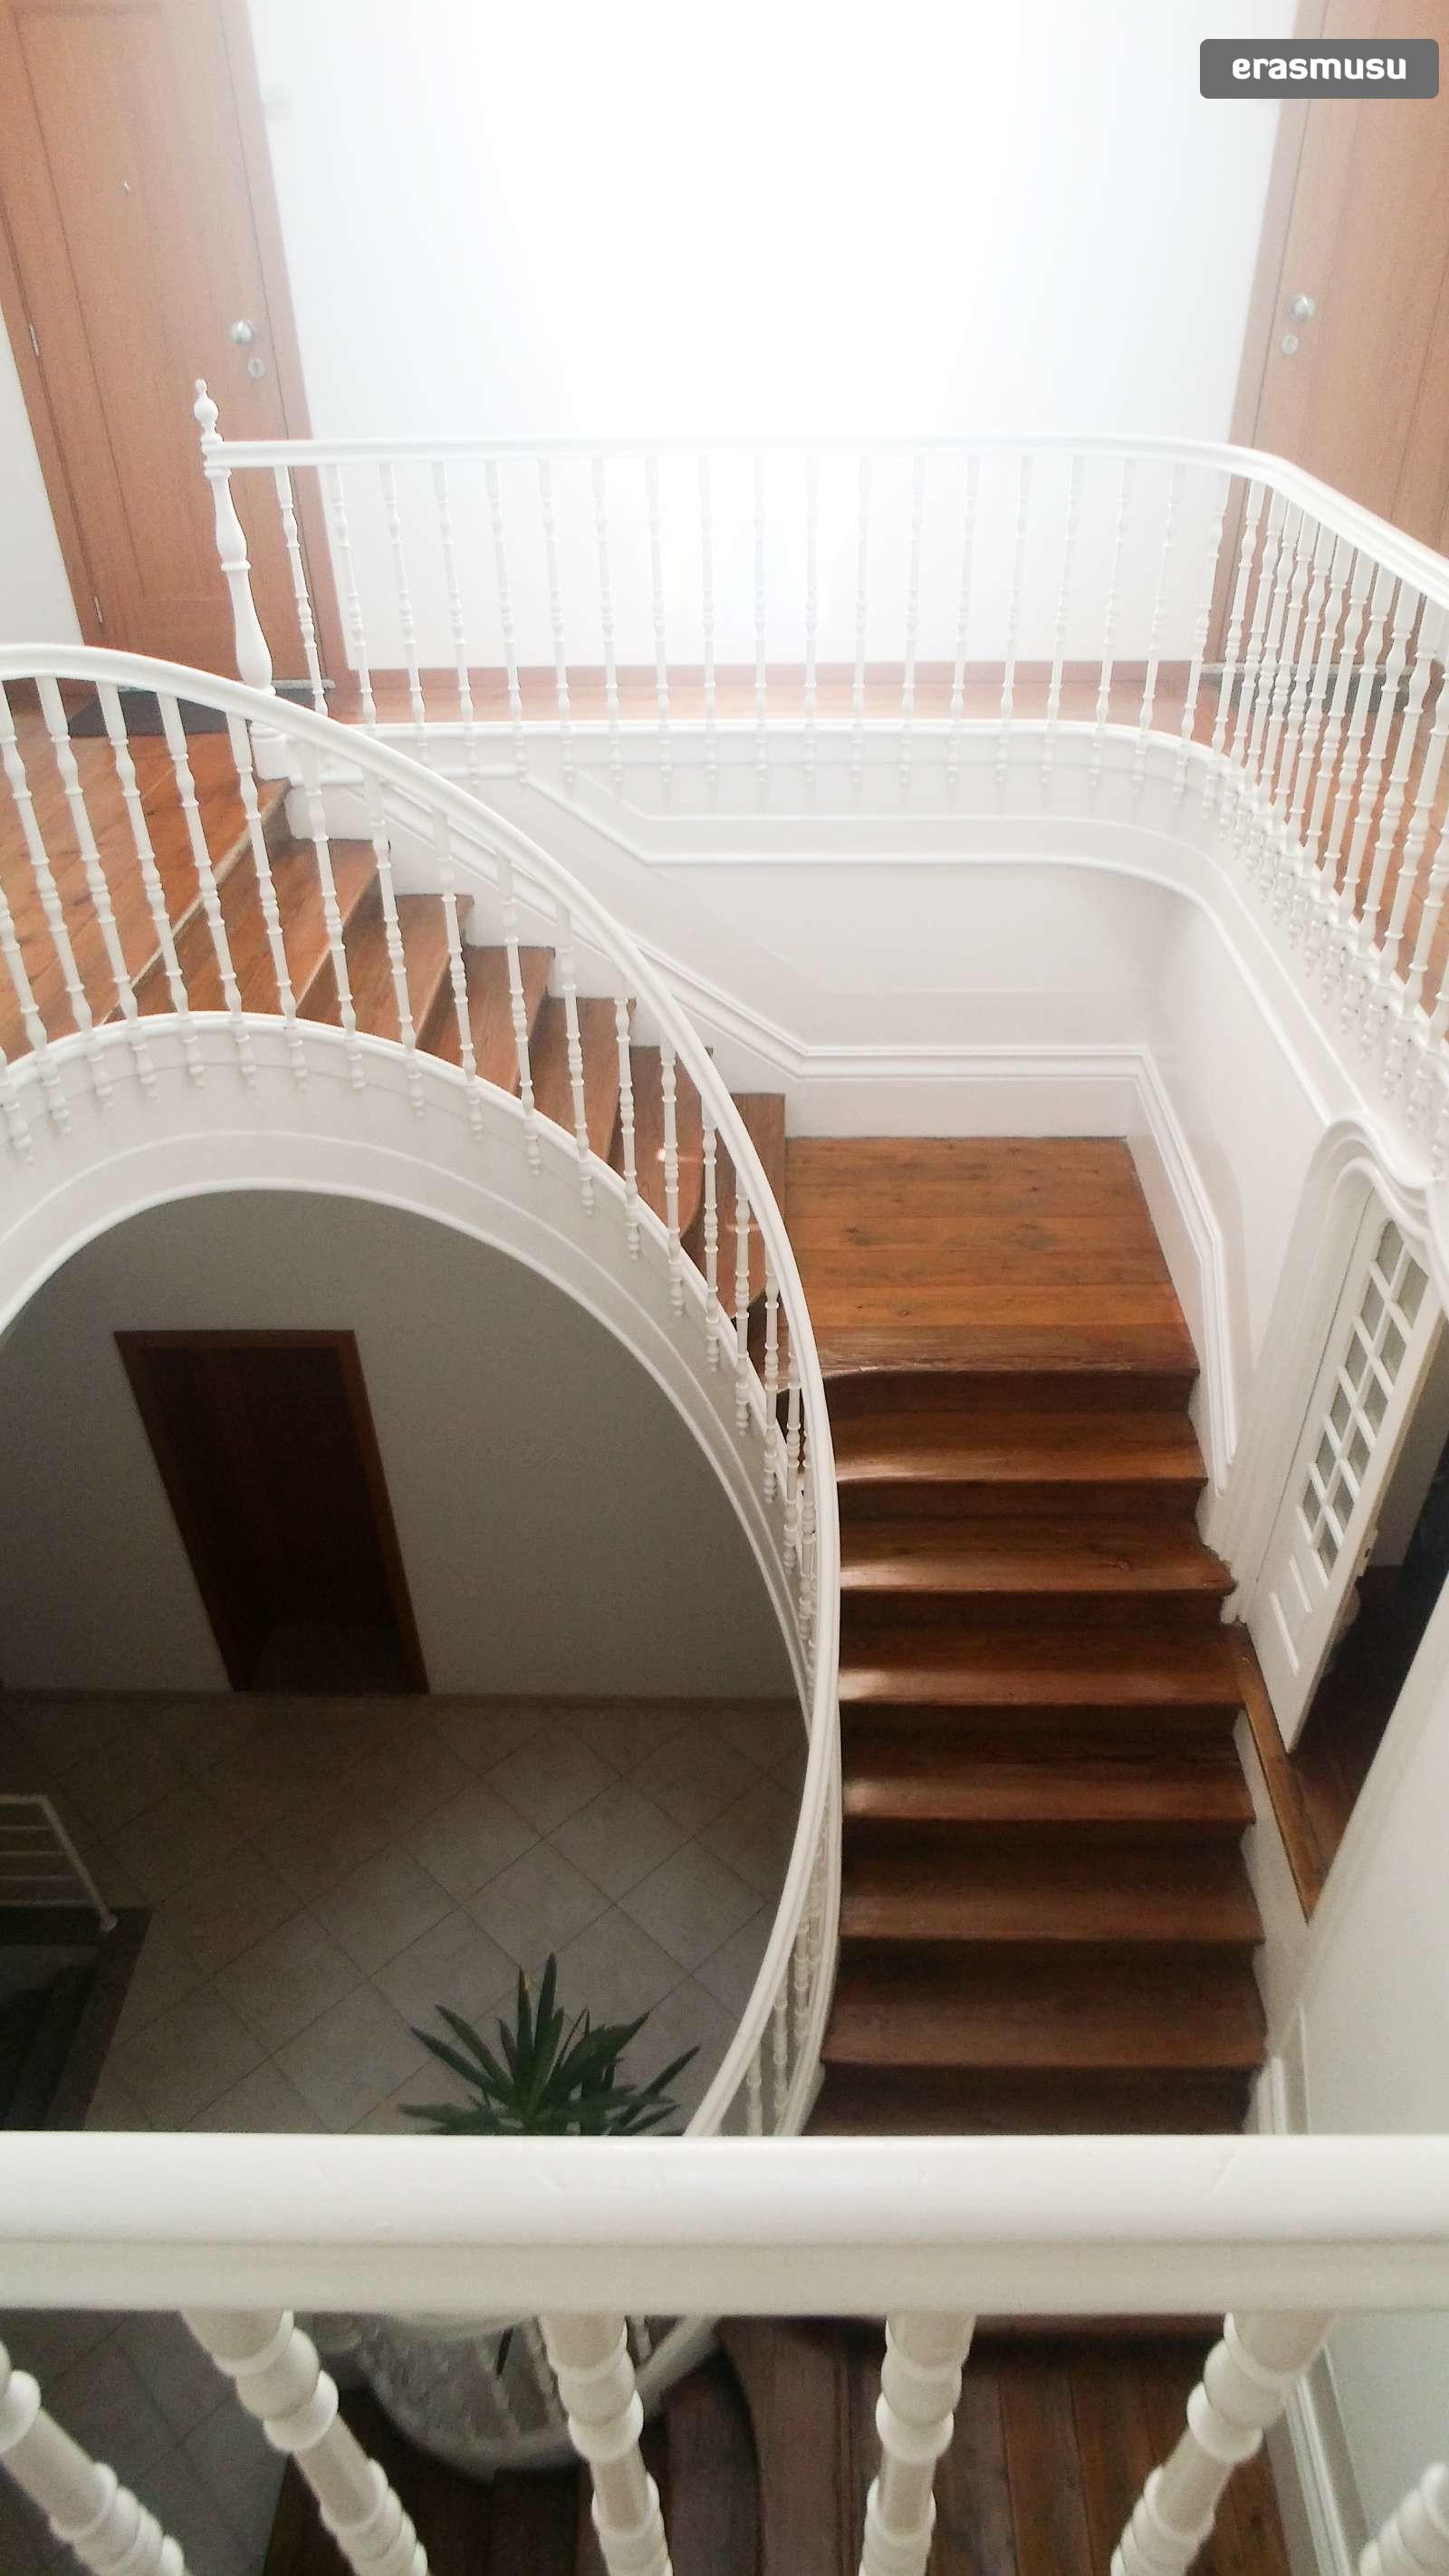 bright-studio-apartment-rent-cedofeita-410f2eeca4c7a617dbf8e320f